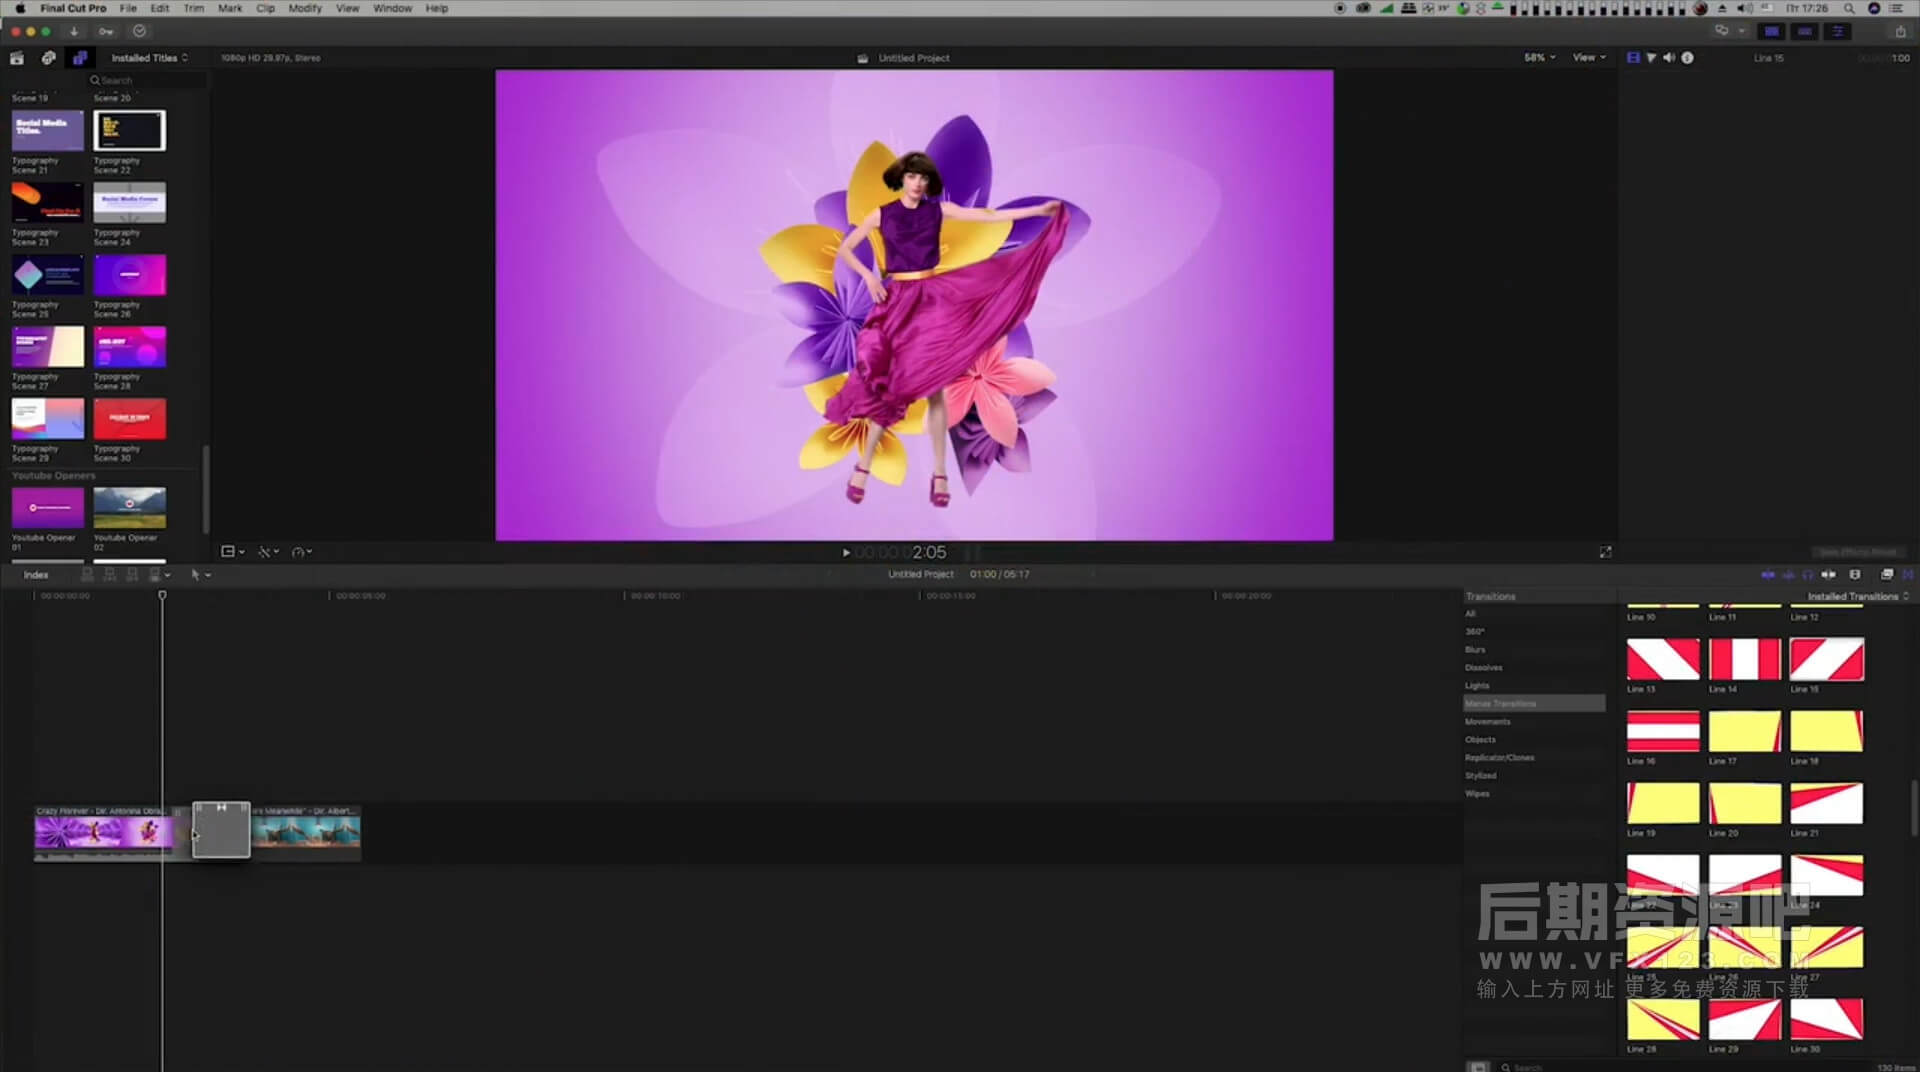 Fcpx插件 190组社交自媒体封面字幕+图形转场 Motion Graphics Pack